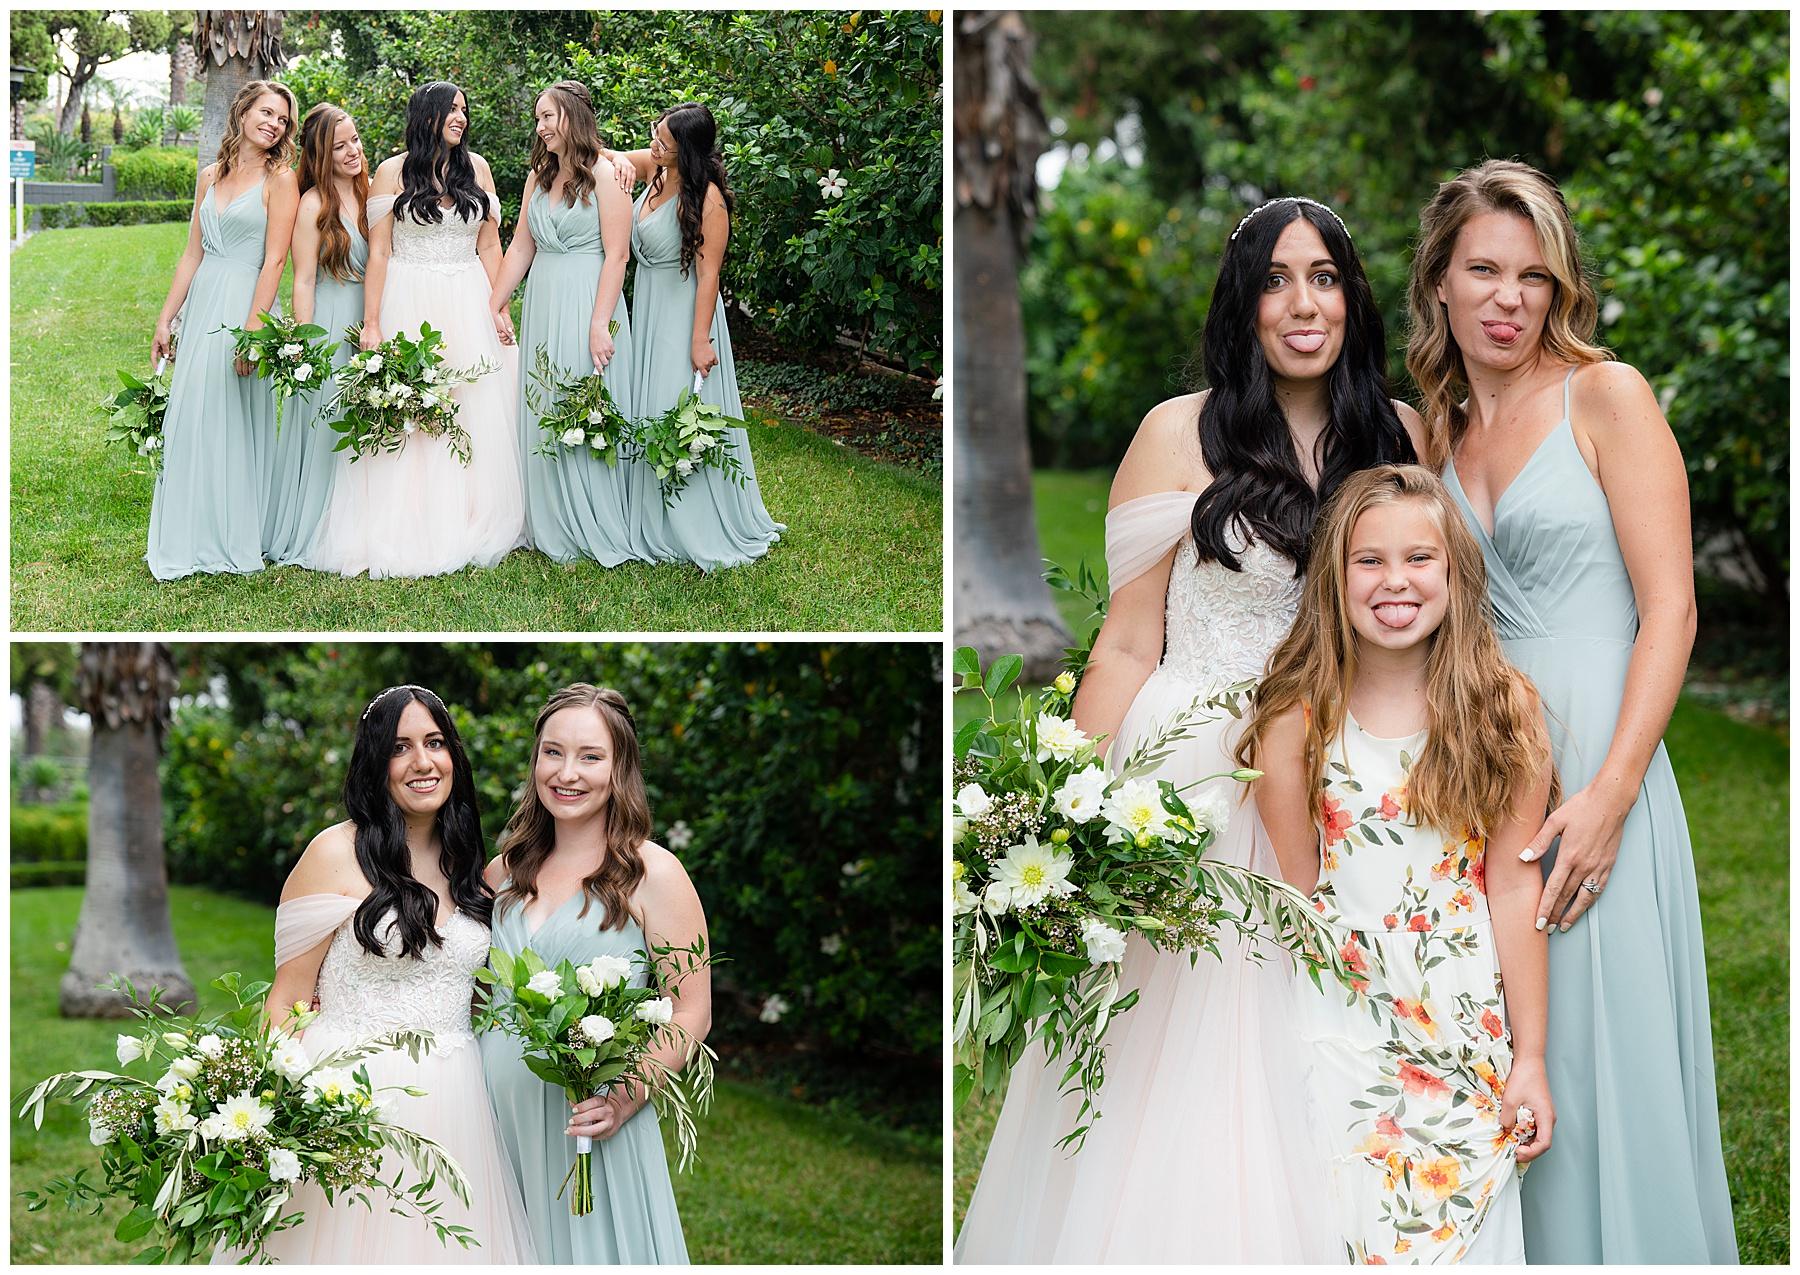 goofy bridesmaids